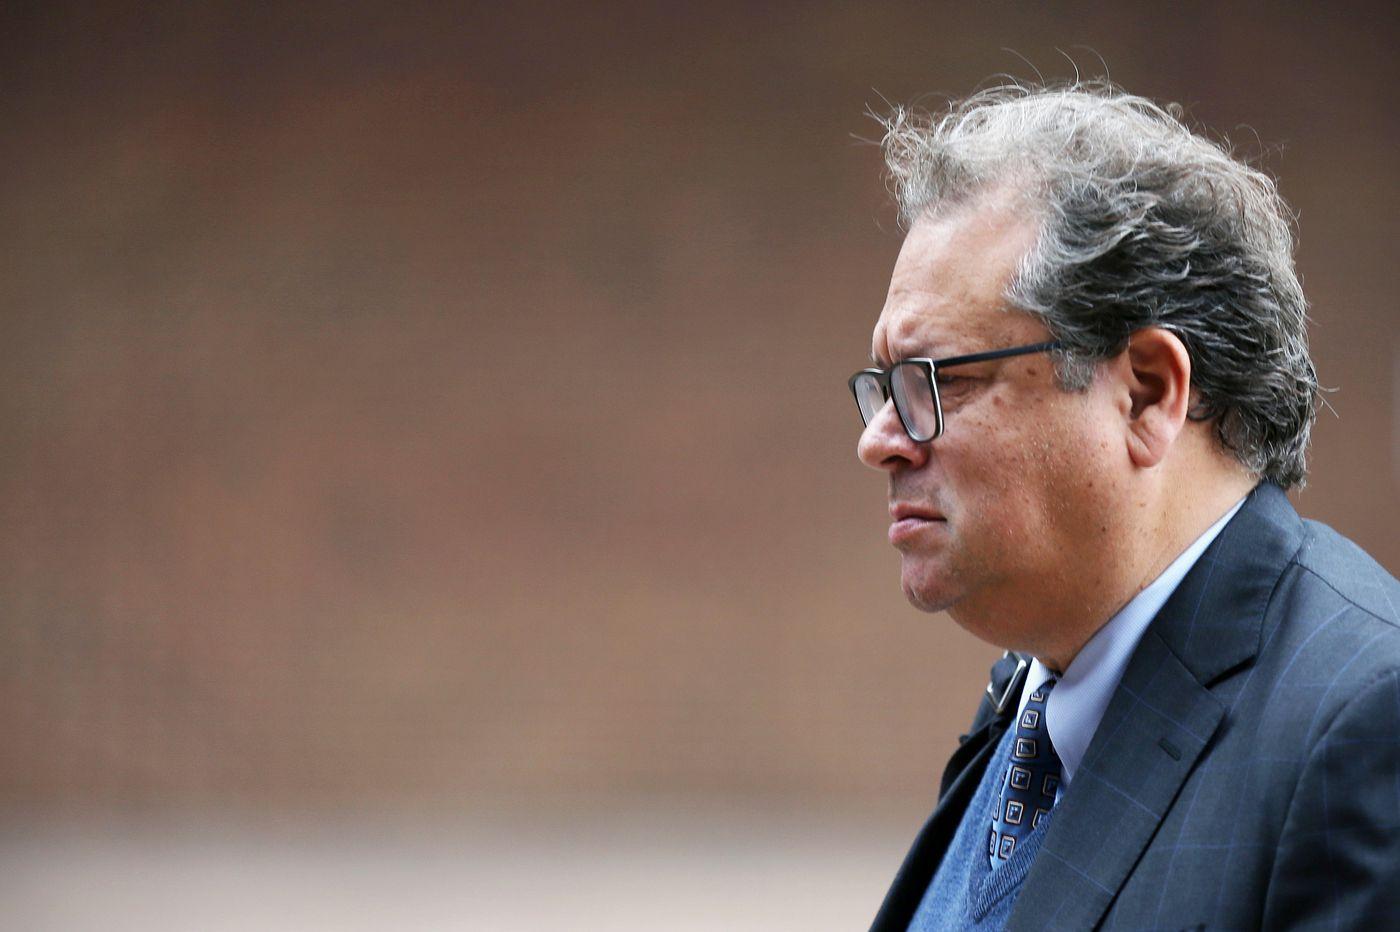 Bob Brady's political guru, Ken Smukler, sentenced to 18 months in prison for campaign finance crimes